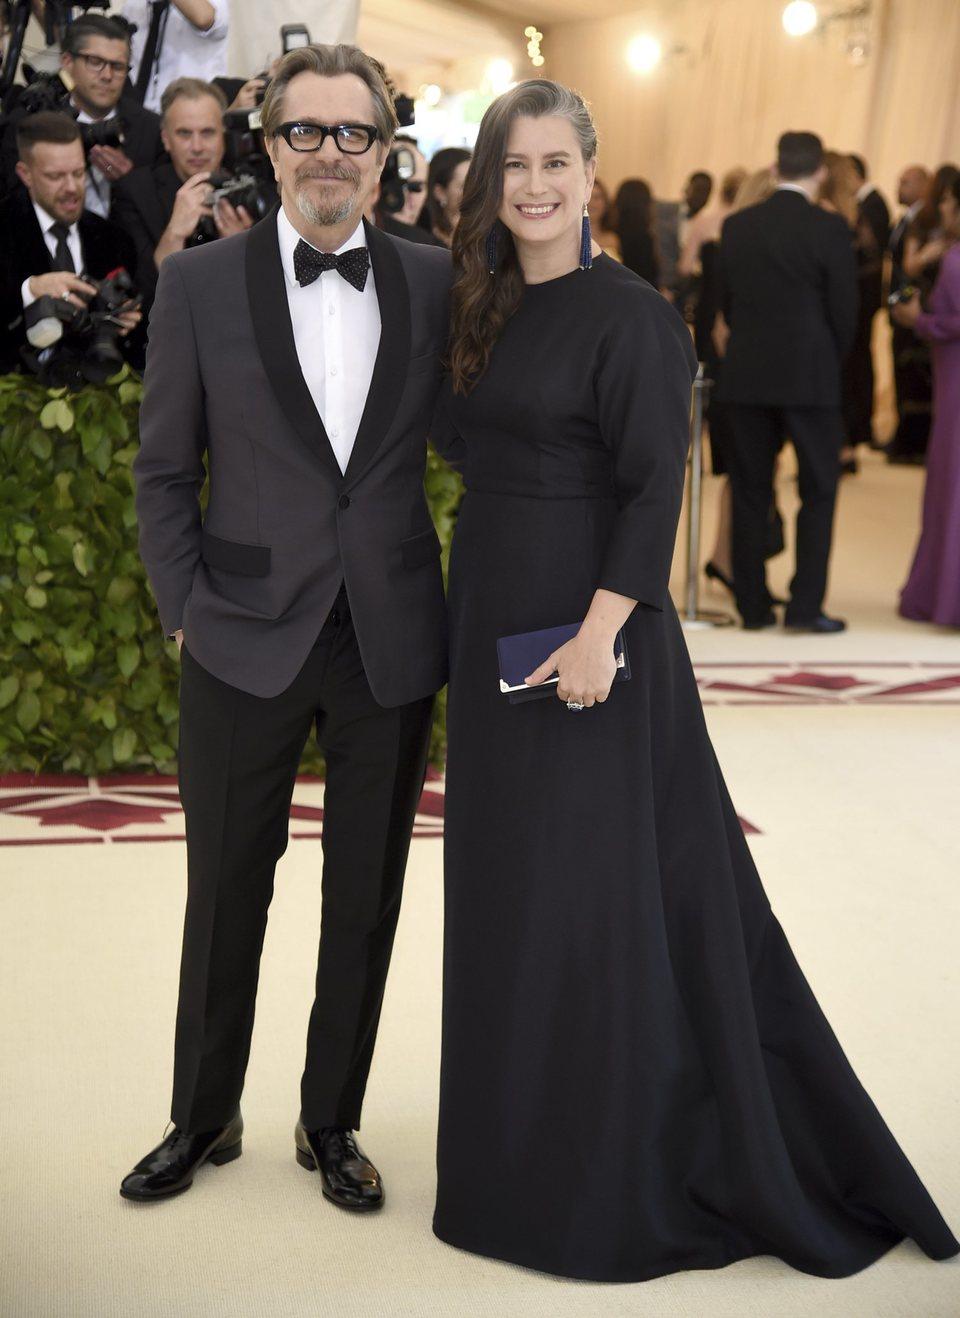 Gary Oldman y su mujer en la Gala Met 2018